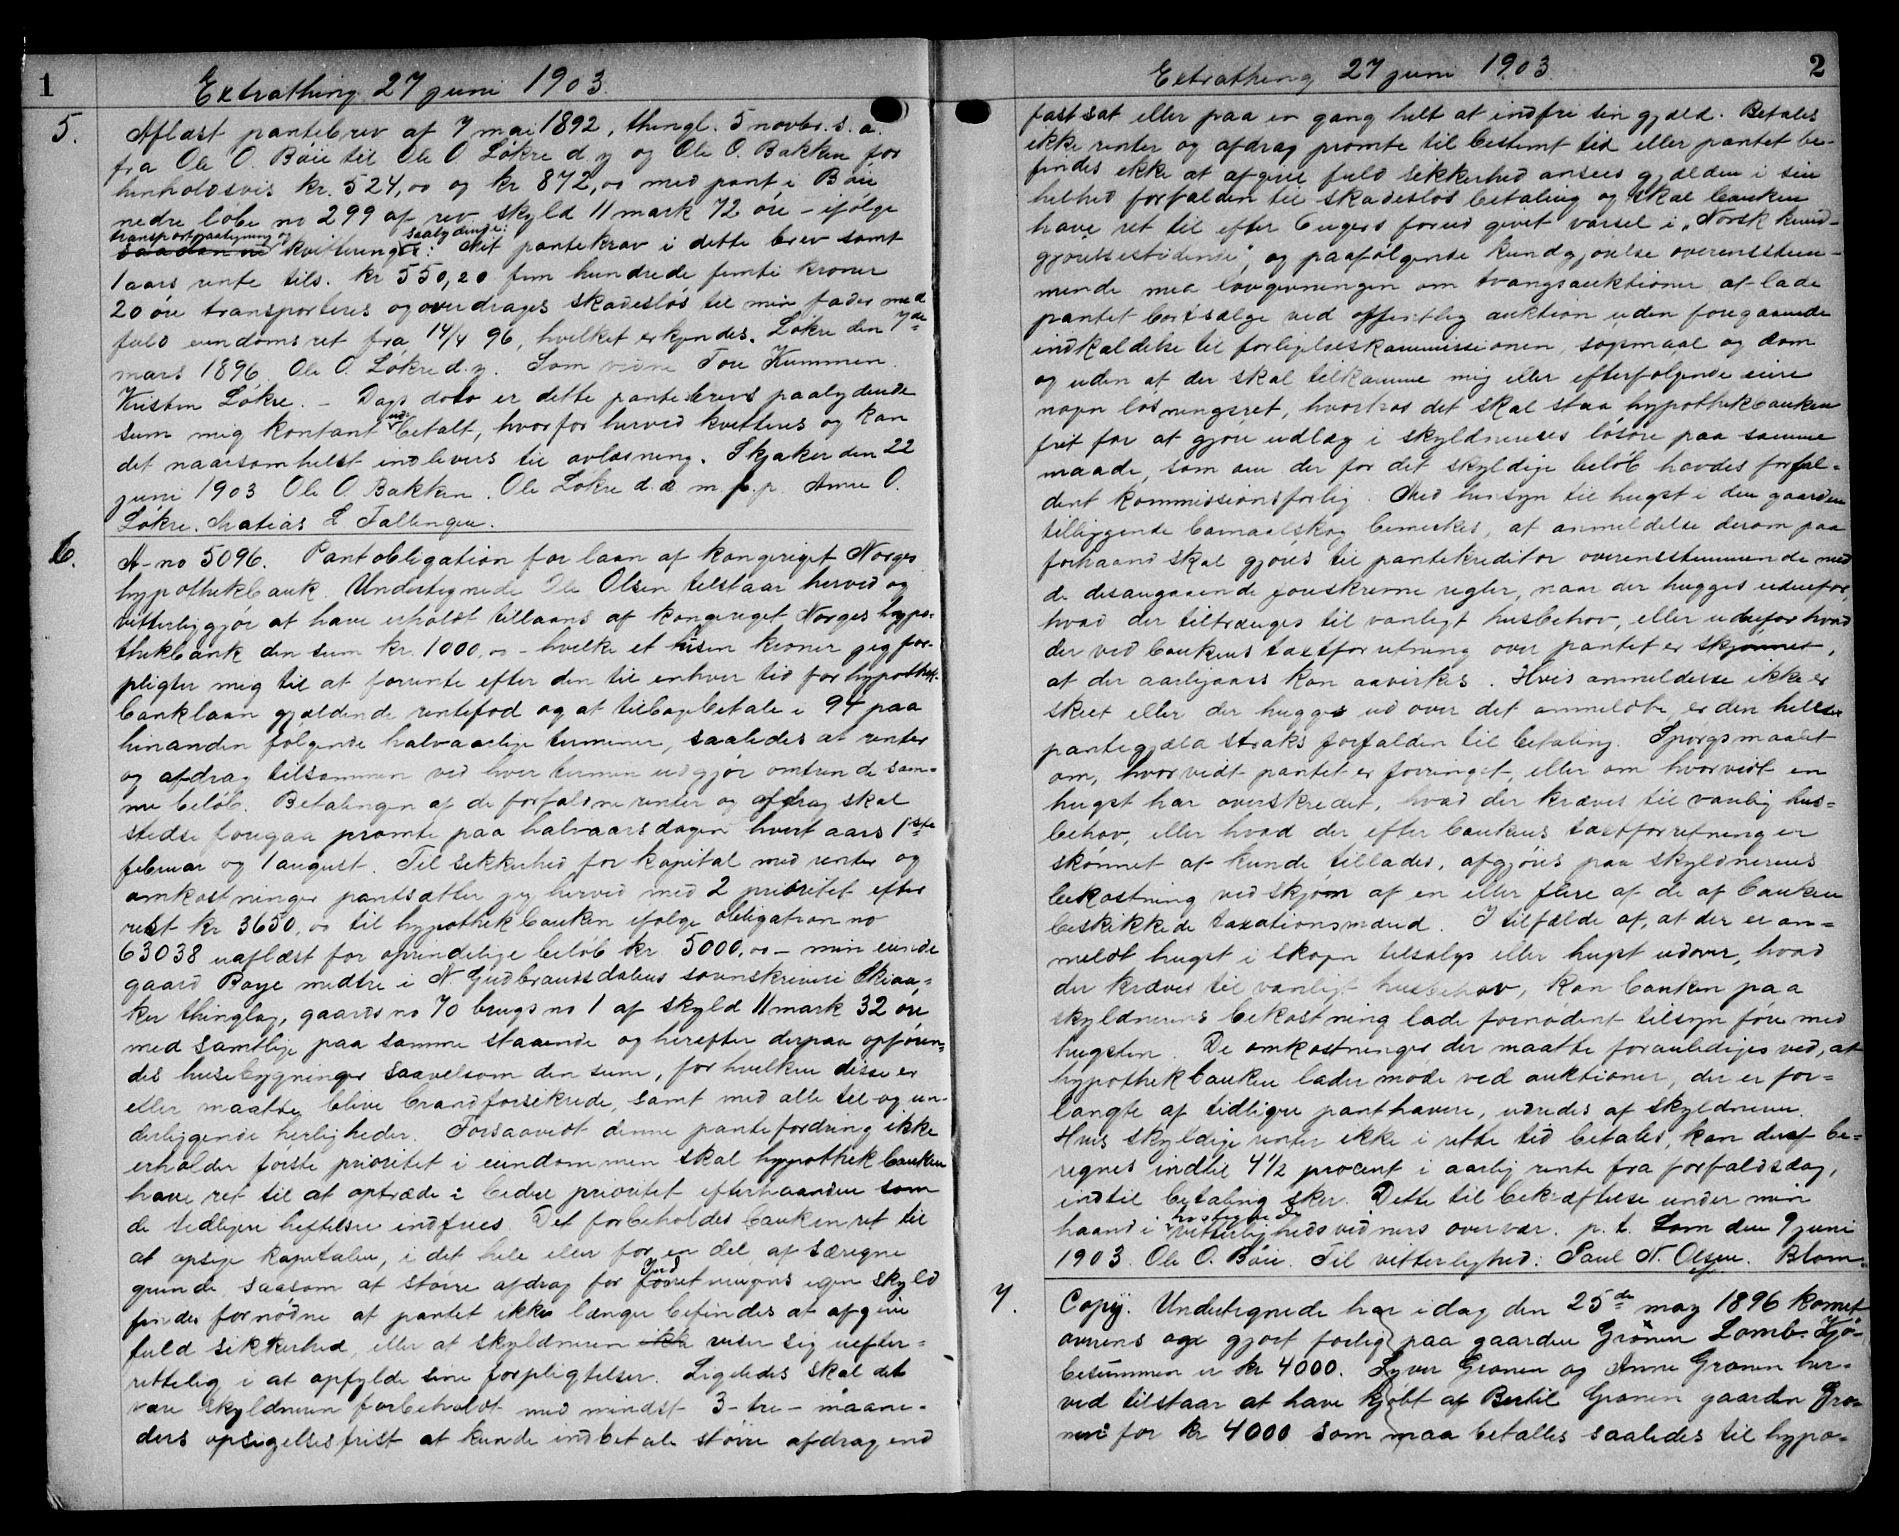 SAH, Nord-Gudbrandsdal tingrett, H/Hb/Hba/L0015: Pantebok nr. 15, 1903-1907, s. 1-2